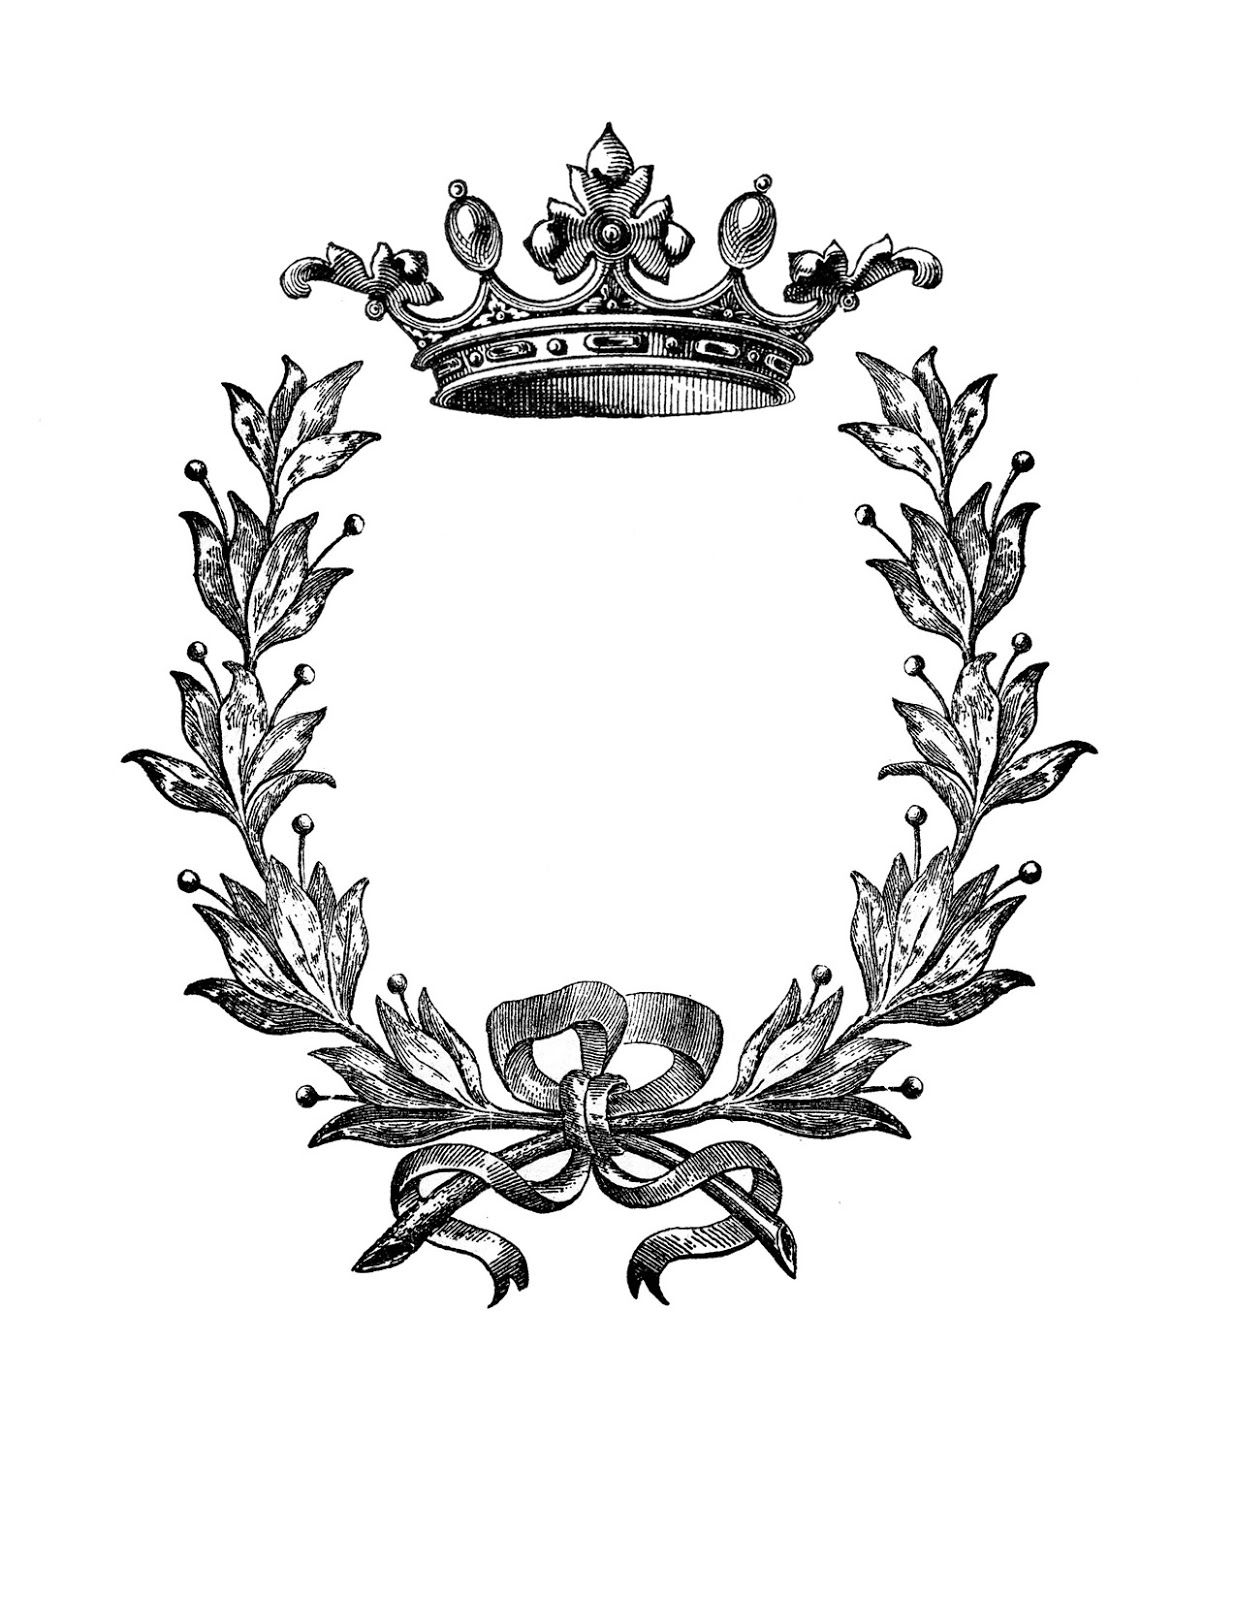 iron on transfer wreath with crown graphics fairy diy dessins imprimer transfert. Black Bedroom Furniture Sets. Home Design Ideas